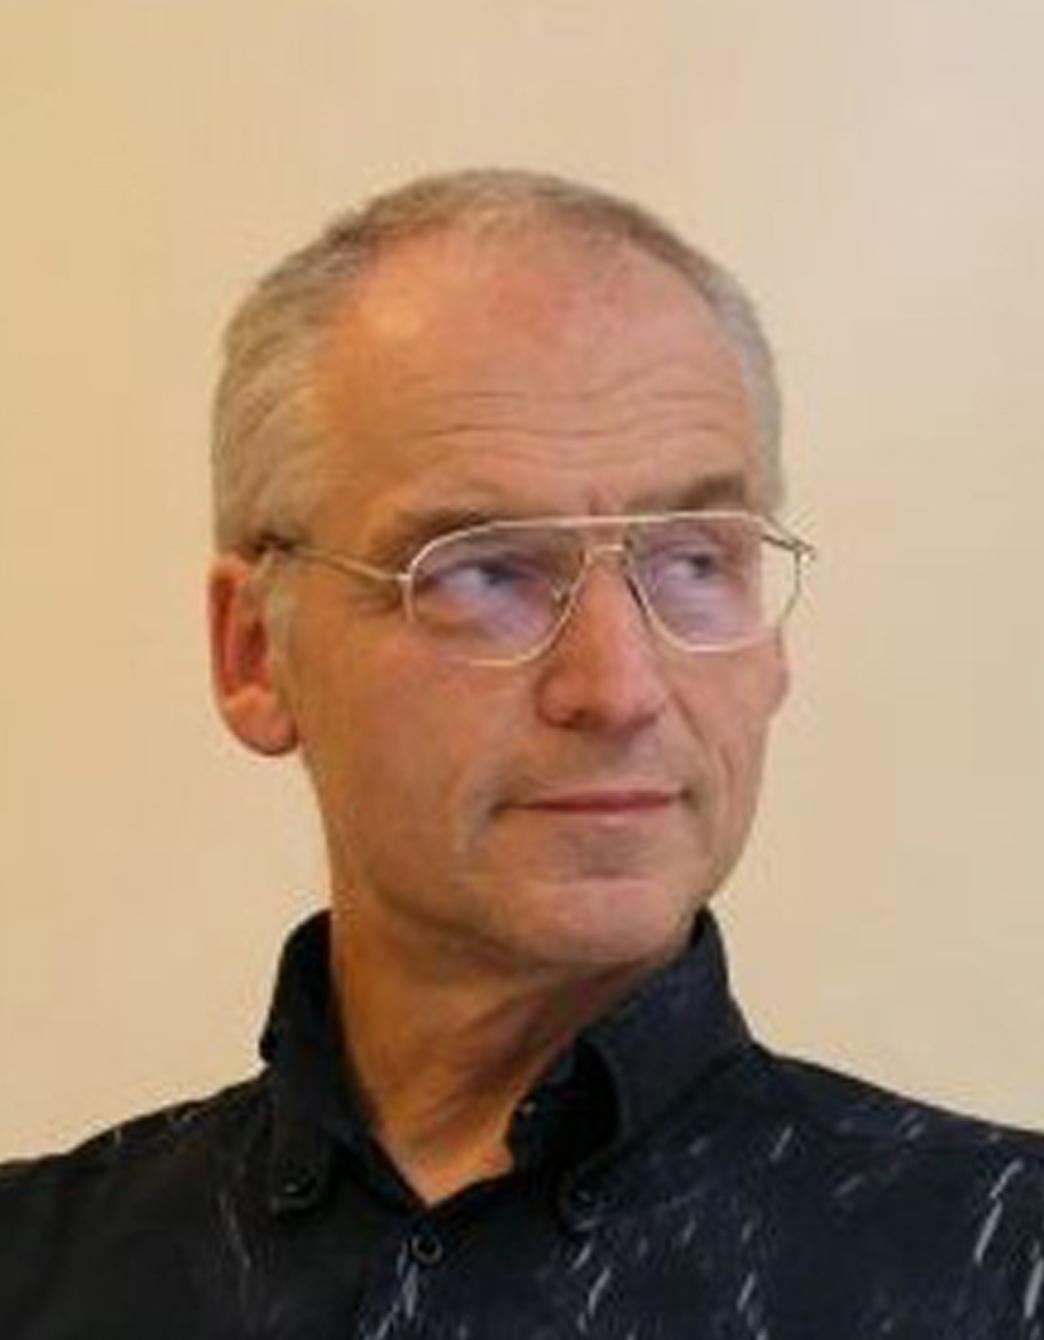 Jürgen Gebert